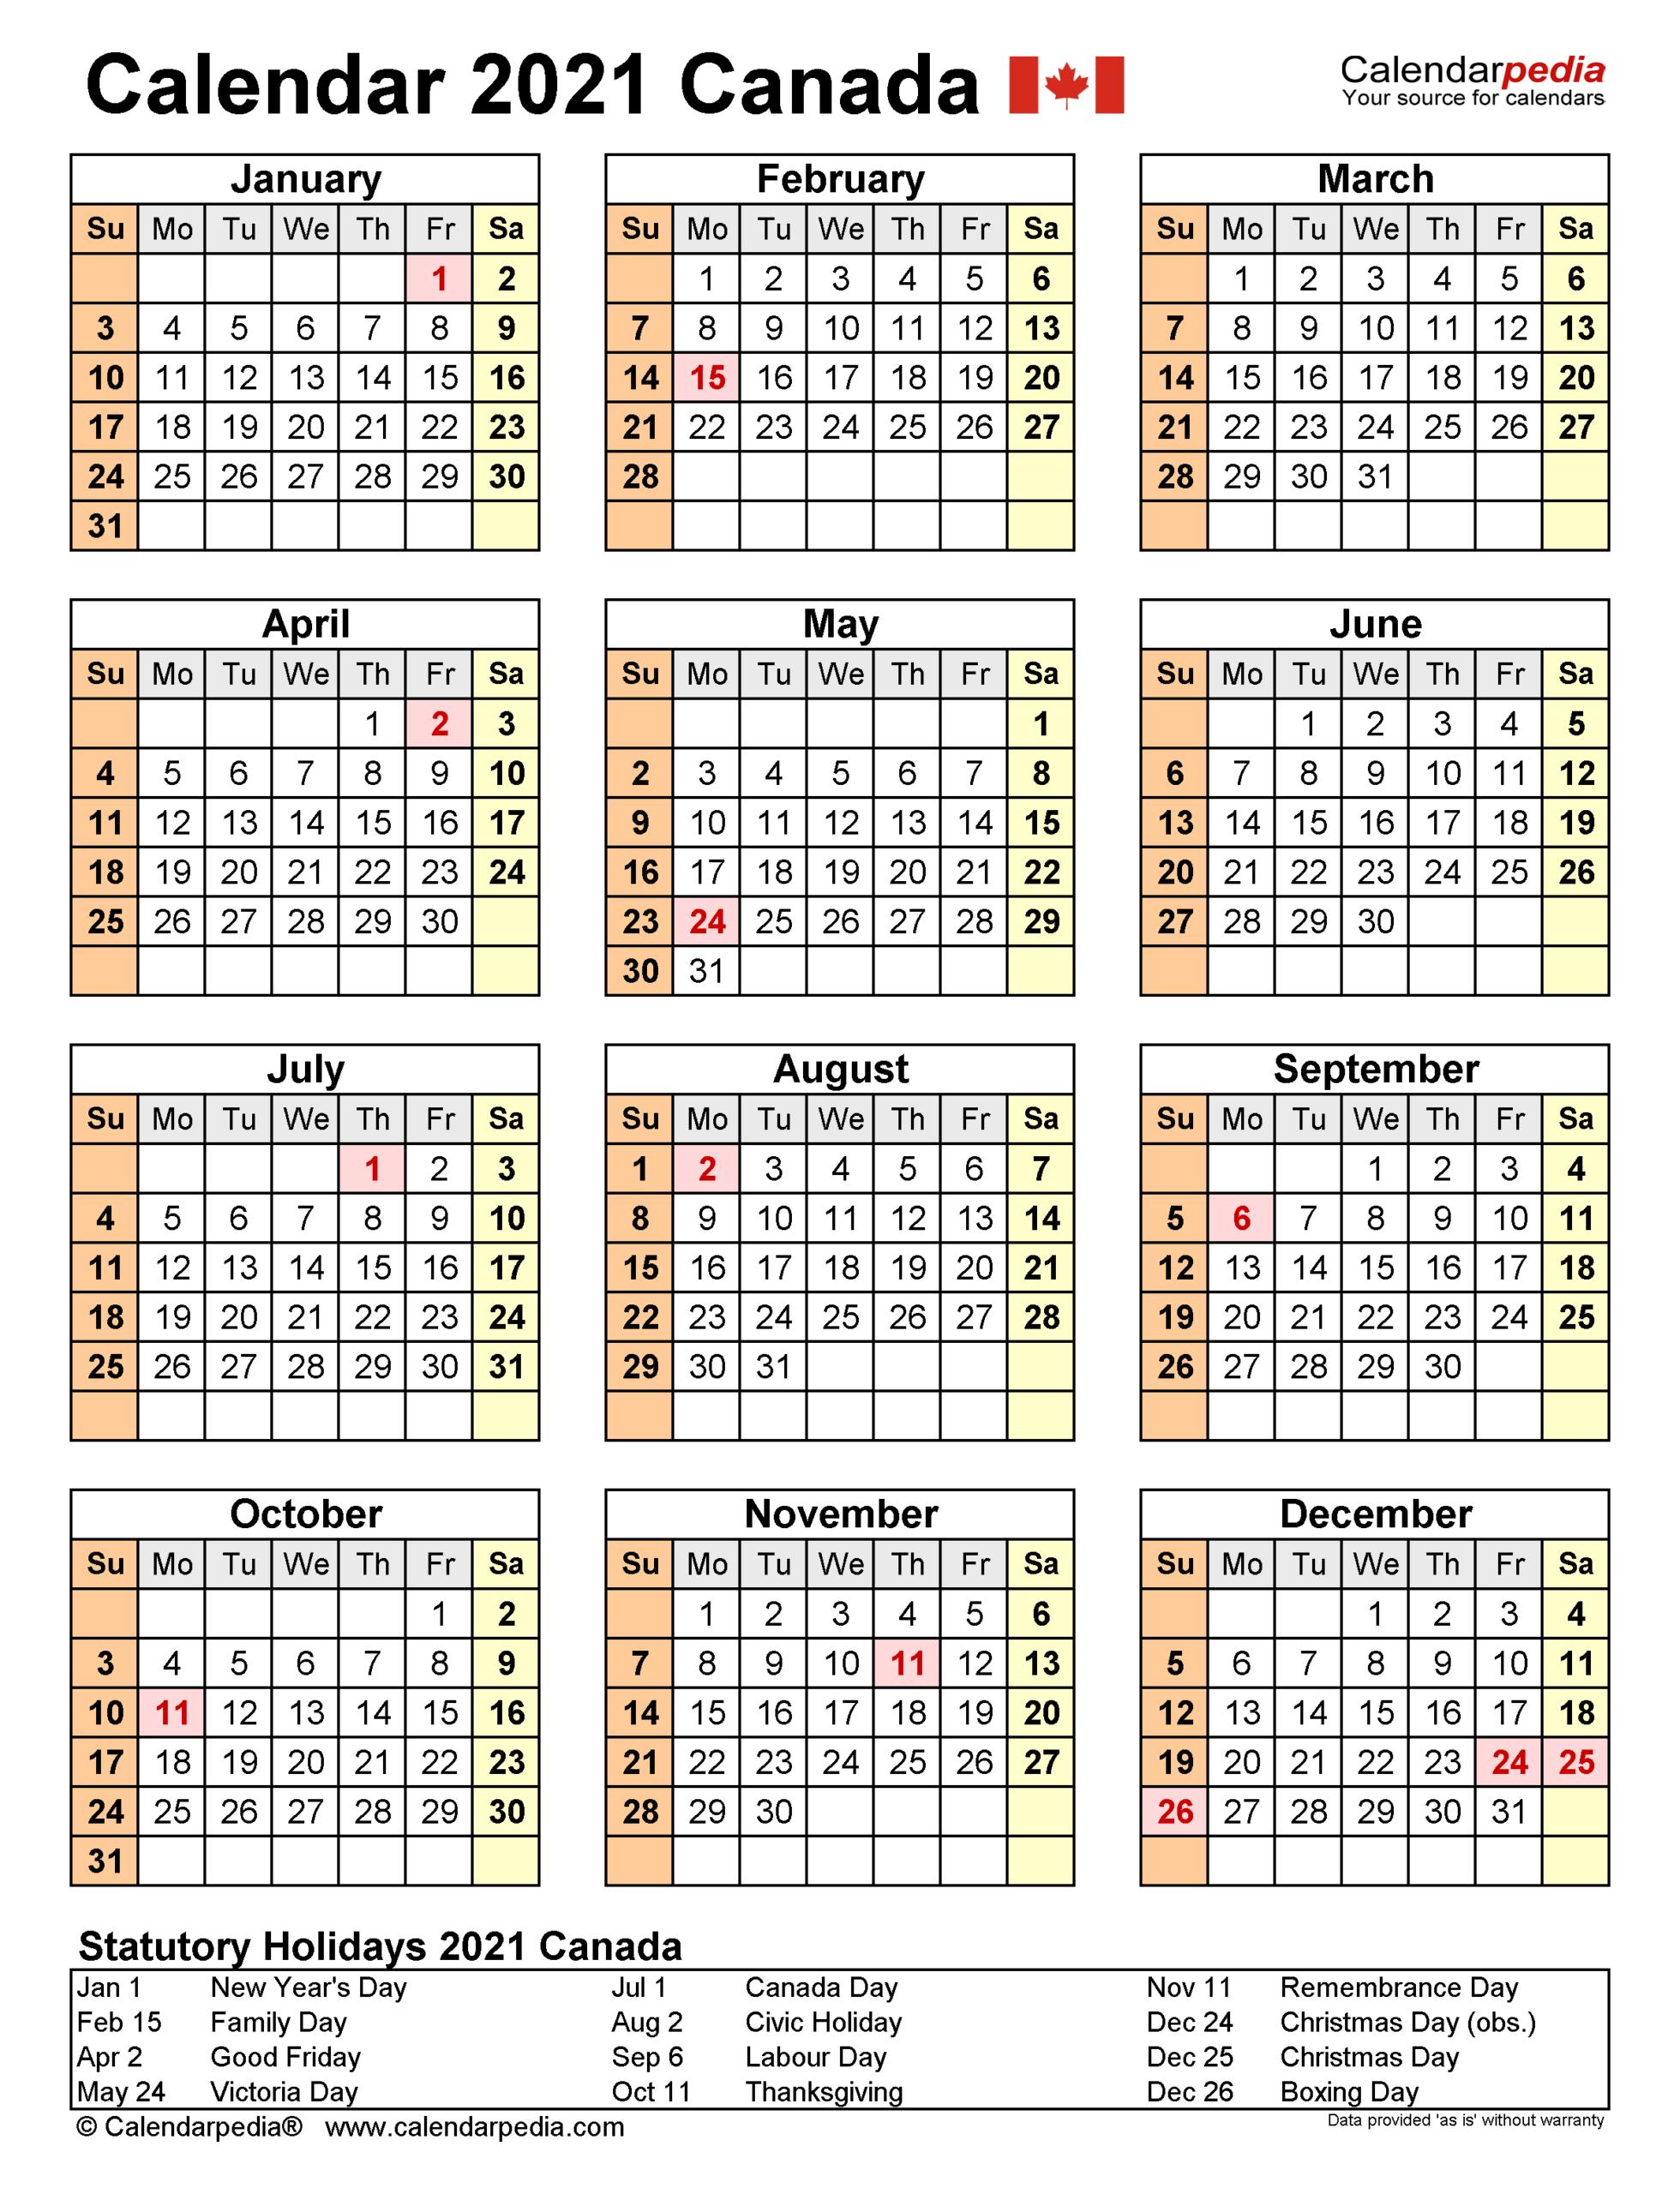 Canadian Statutory Holidays 2021